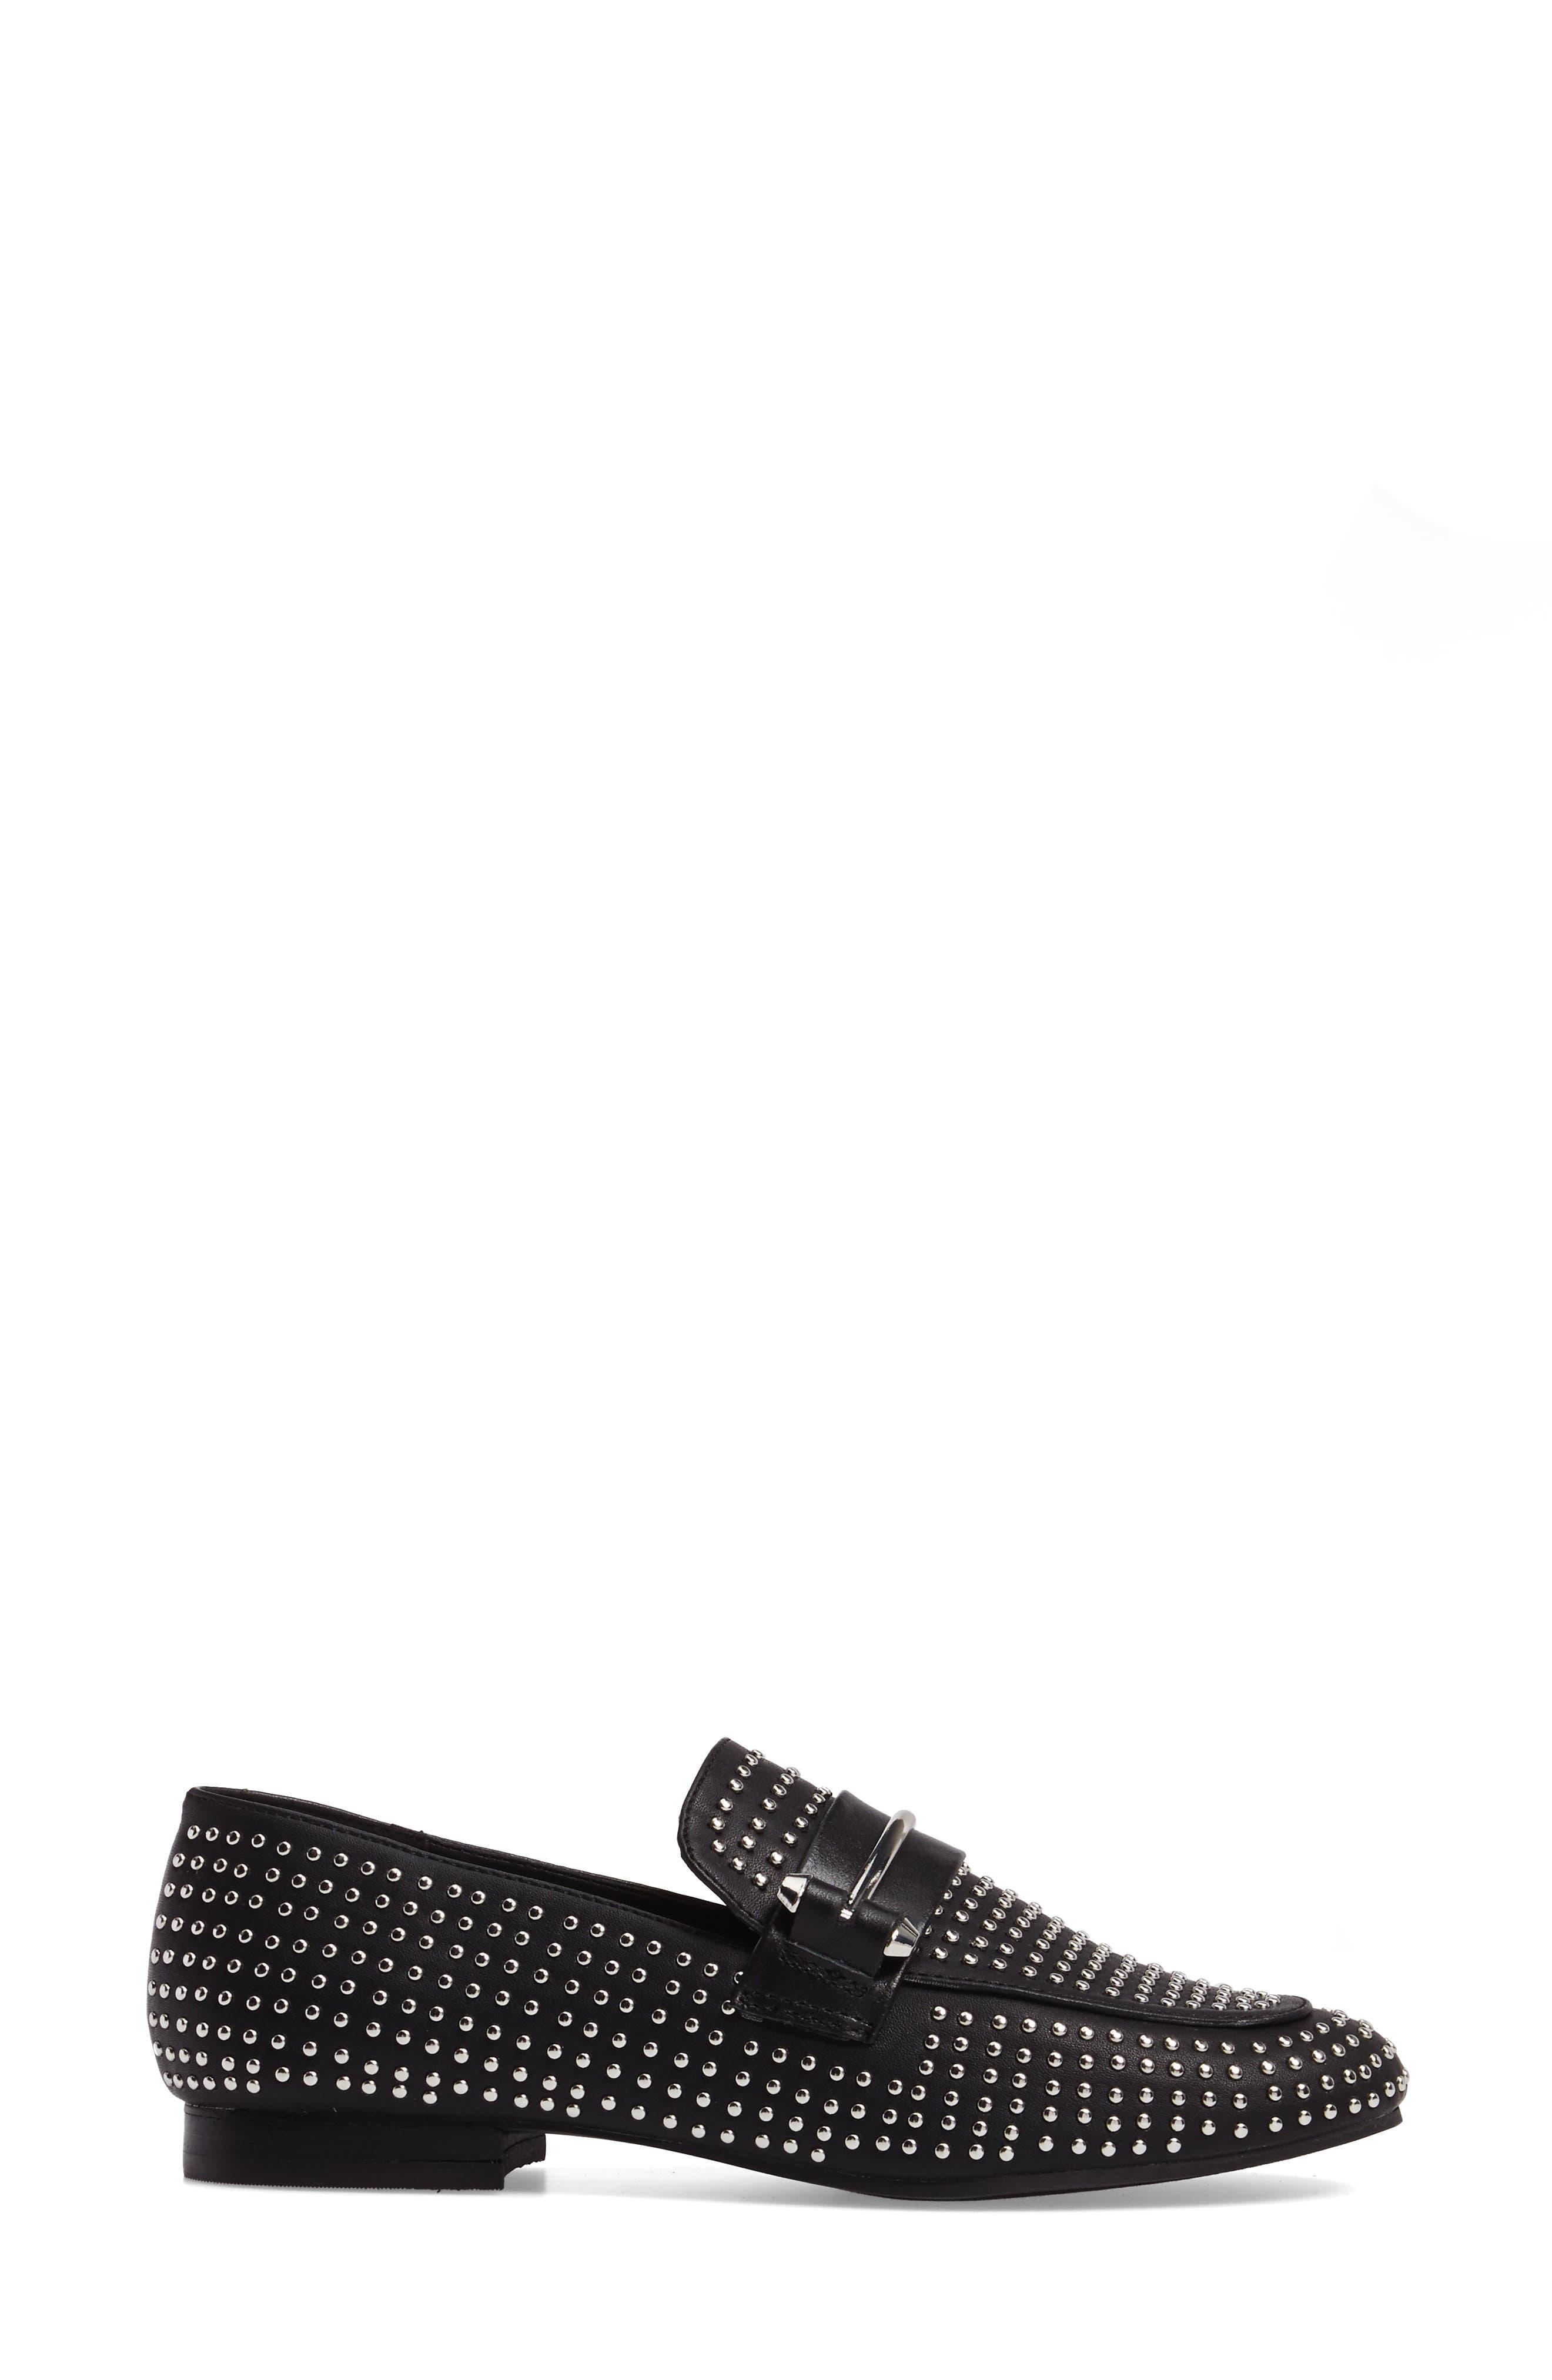 Kast Studded Loafer,                             Alternate thumbnail 3, color,                             Black Faux Leather